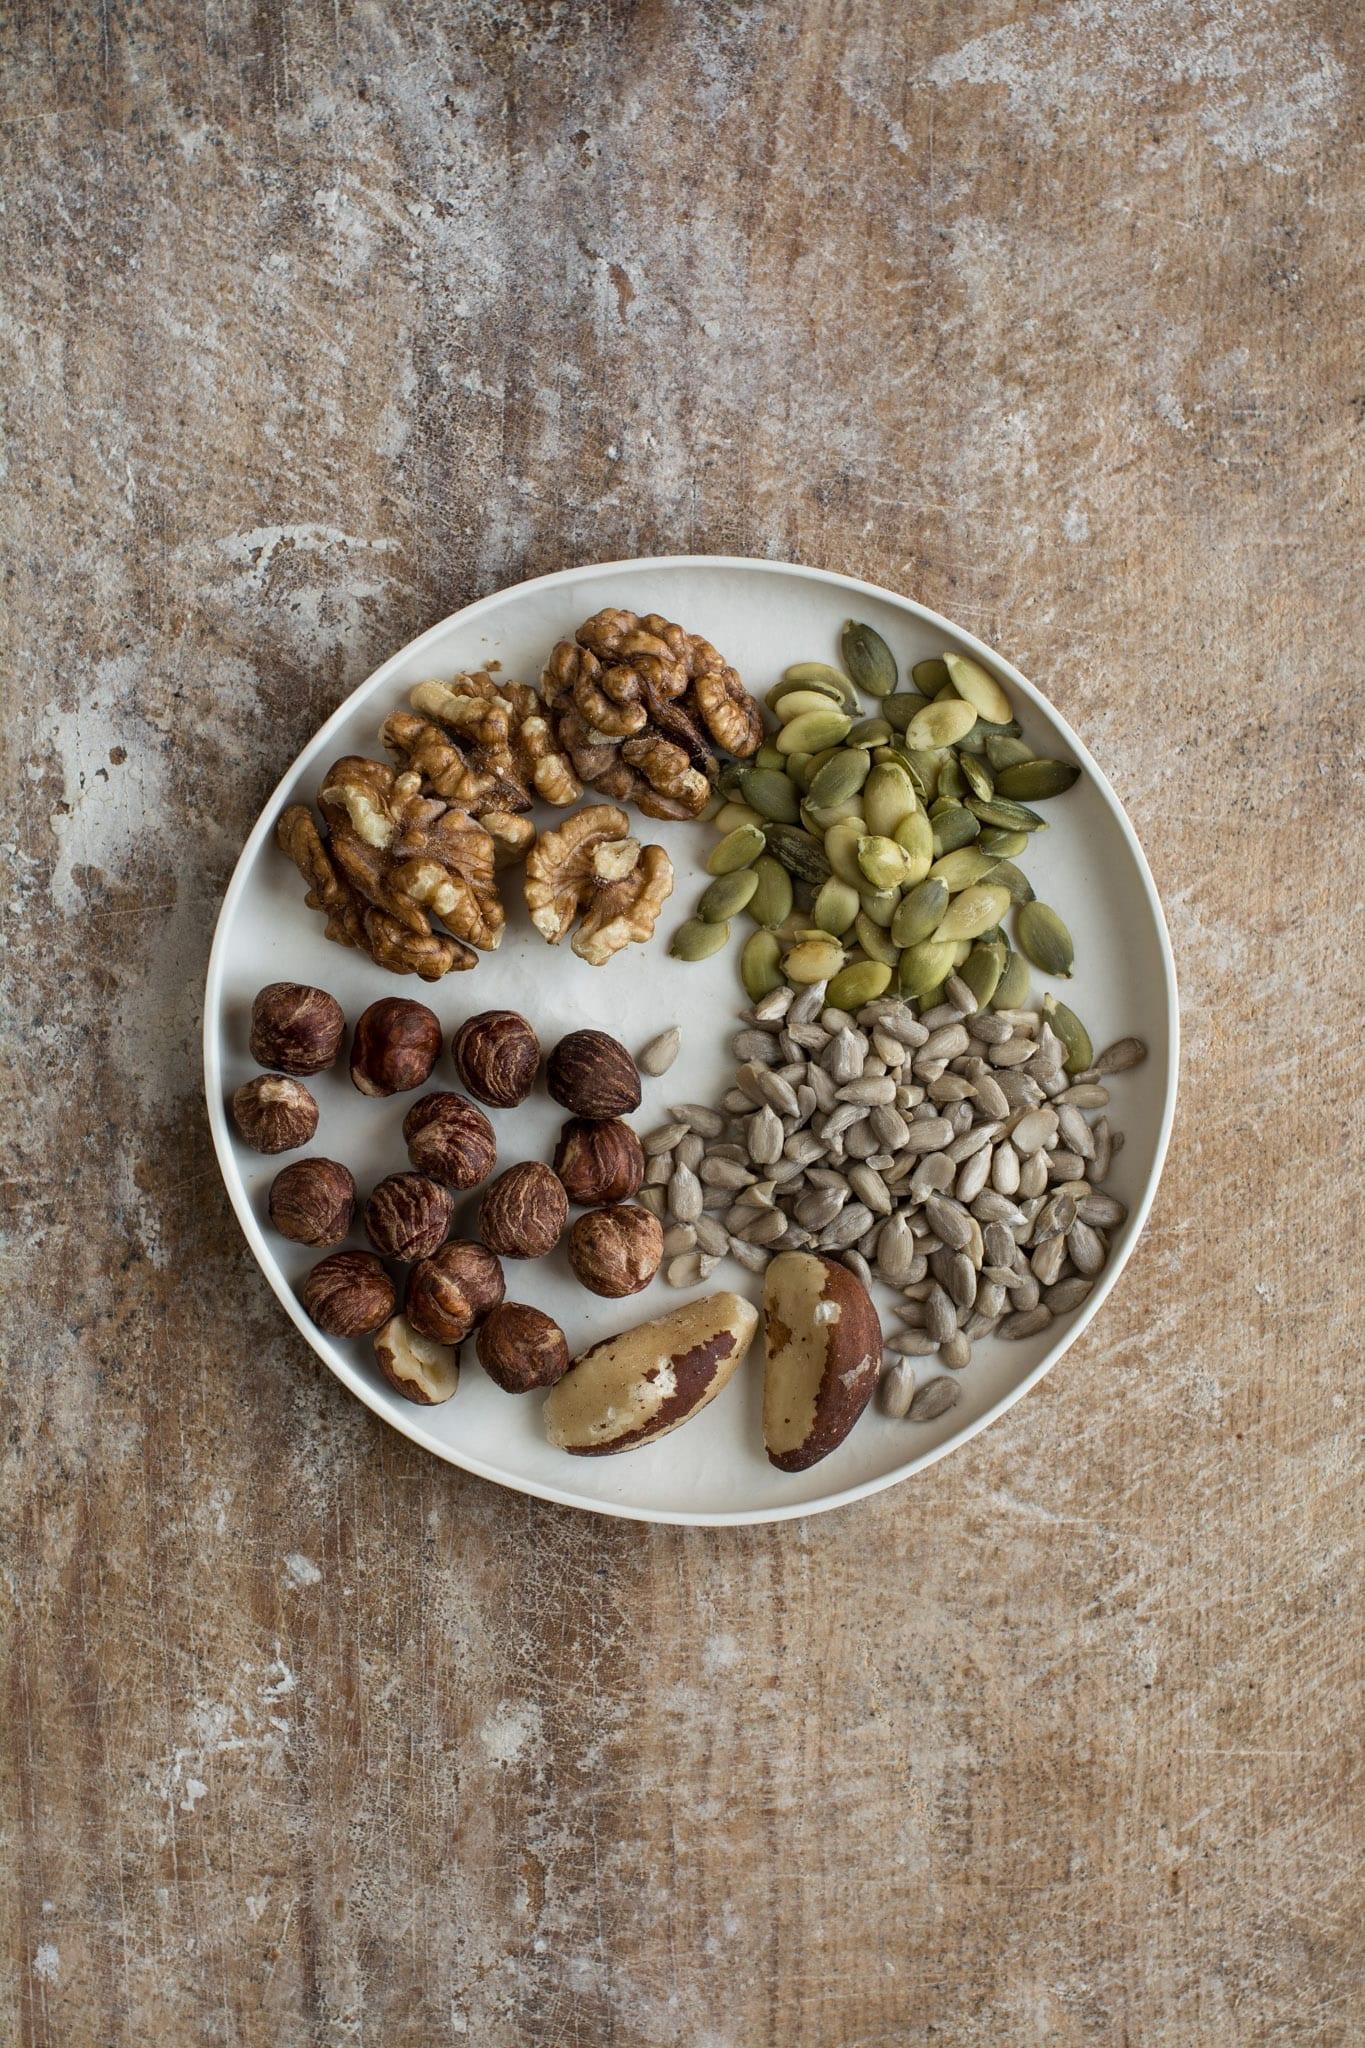 Vegan Candida Cleanse Snacks Recipes